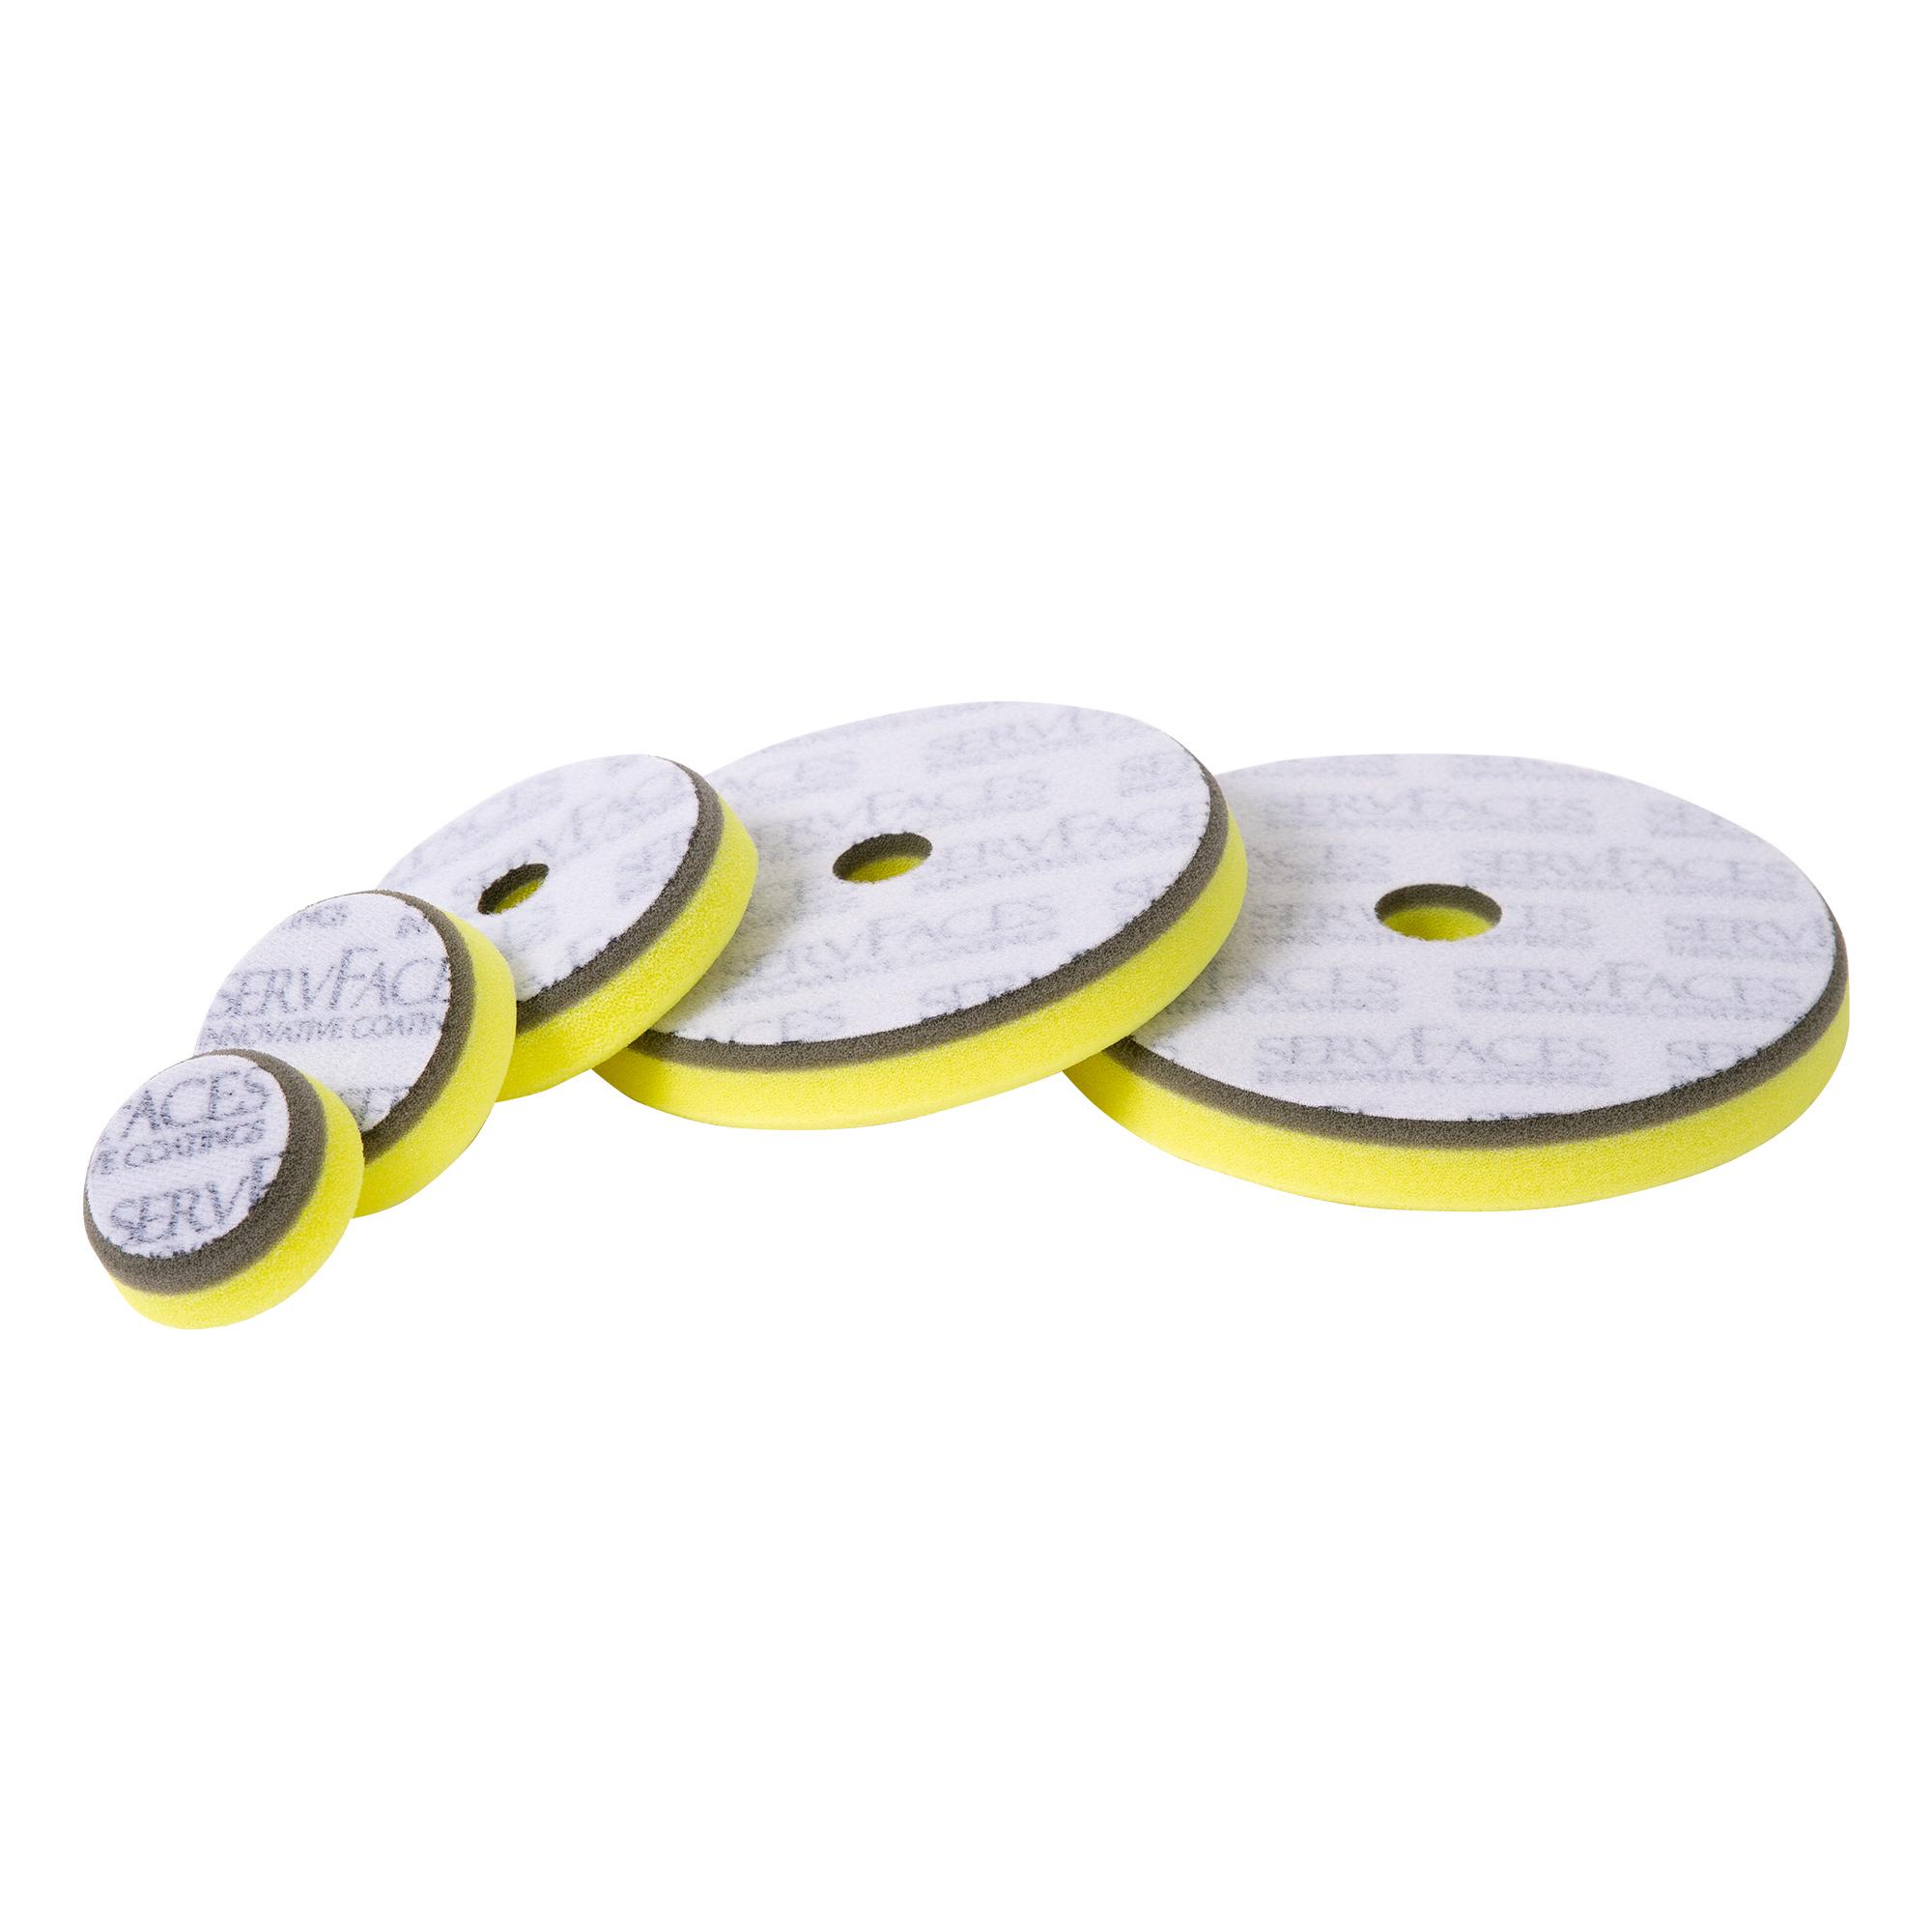 Polierschwamm V1 (grau/gelb-hart, offenzellig)